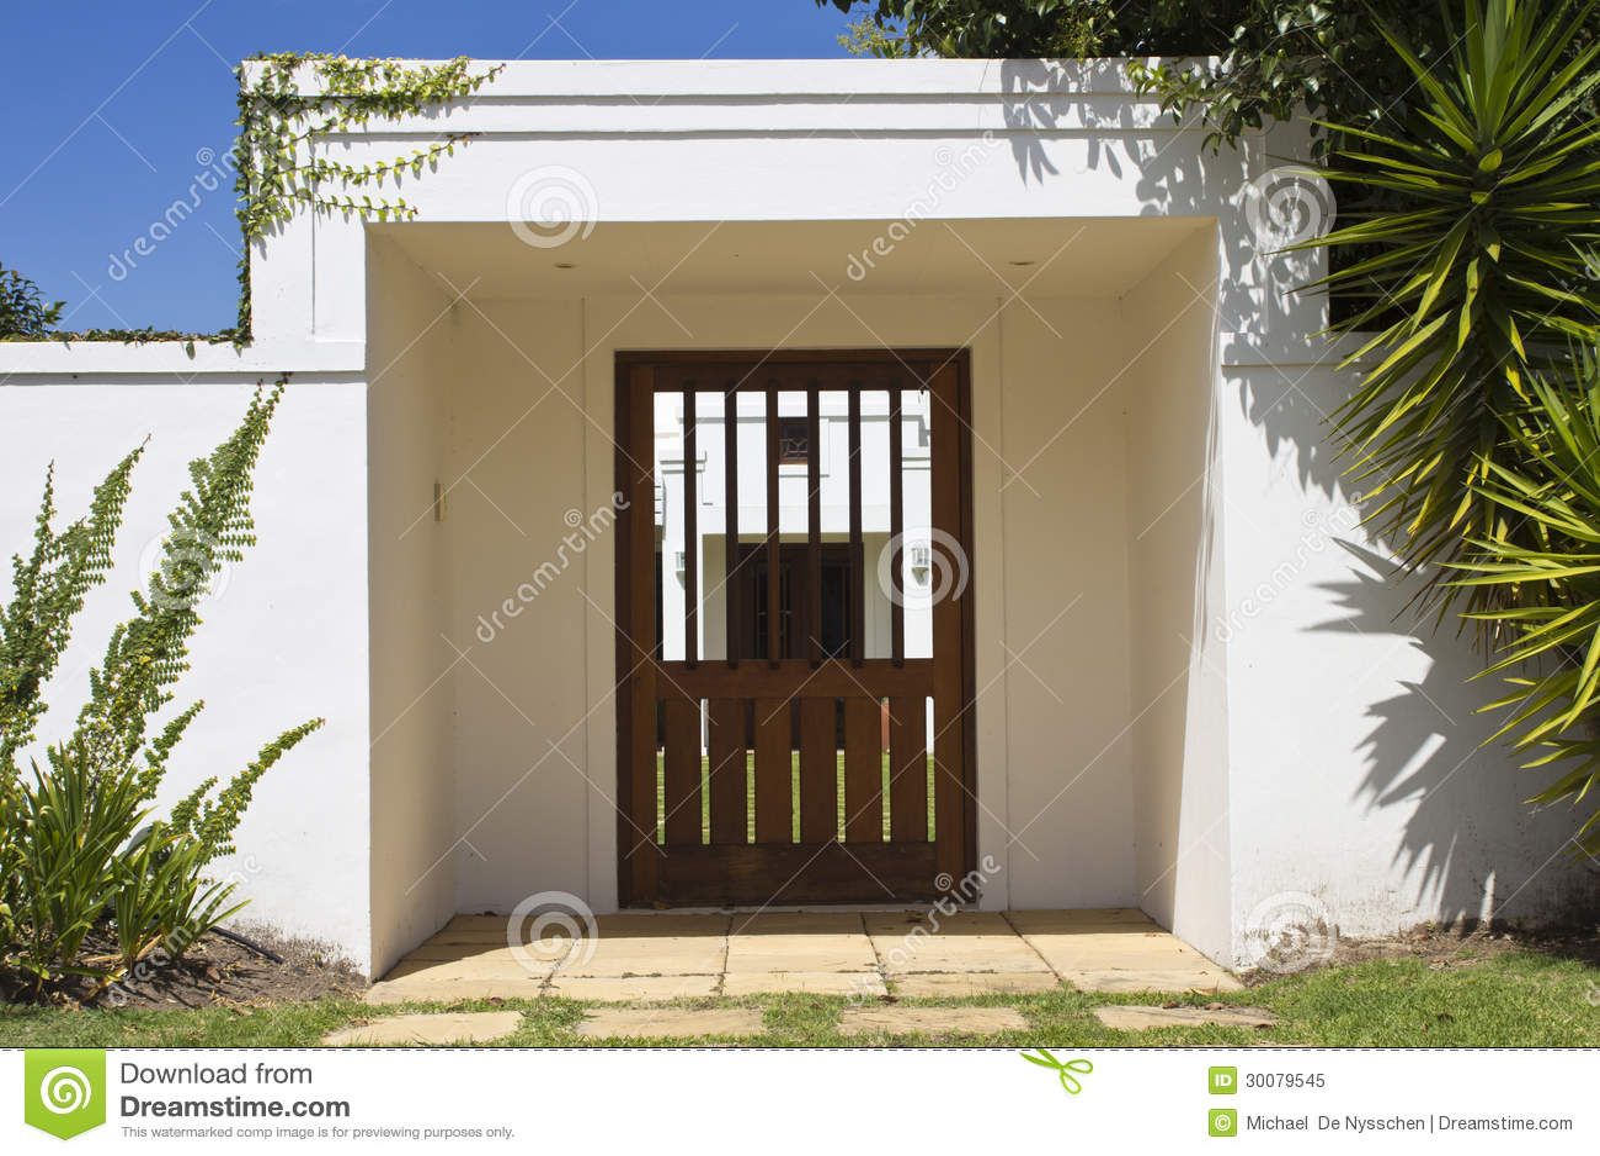 porte d 39 entr e de jardin image stock image du creeper 30079545. Black Bedroom Furniture Sets. Home Design Ideas